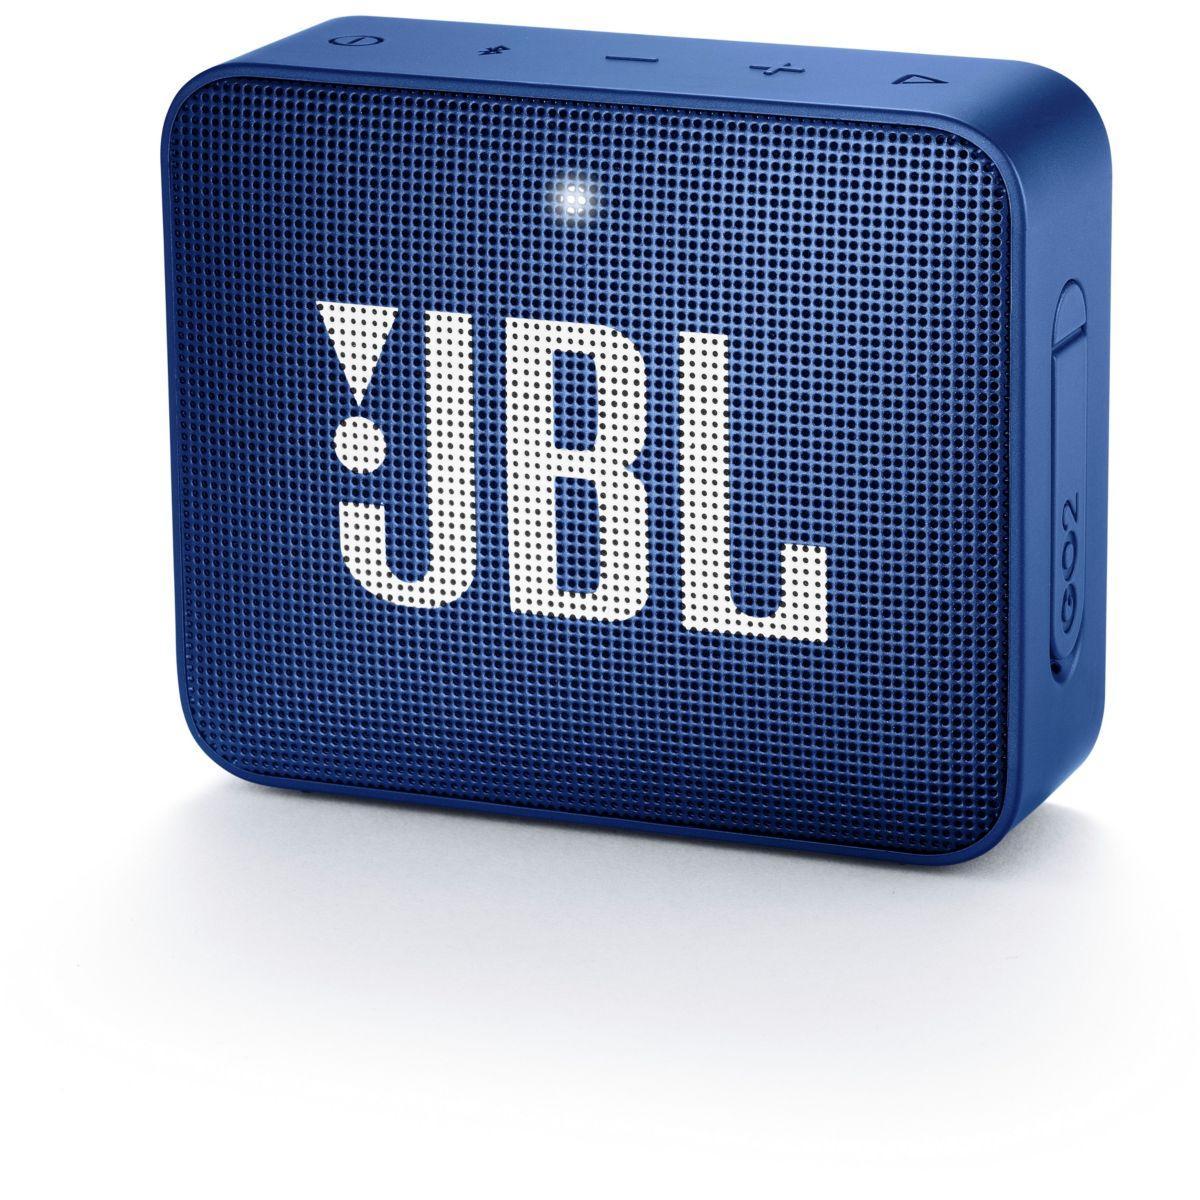 Enceinte bluetooth jbl go 2 bleu (photo)